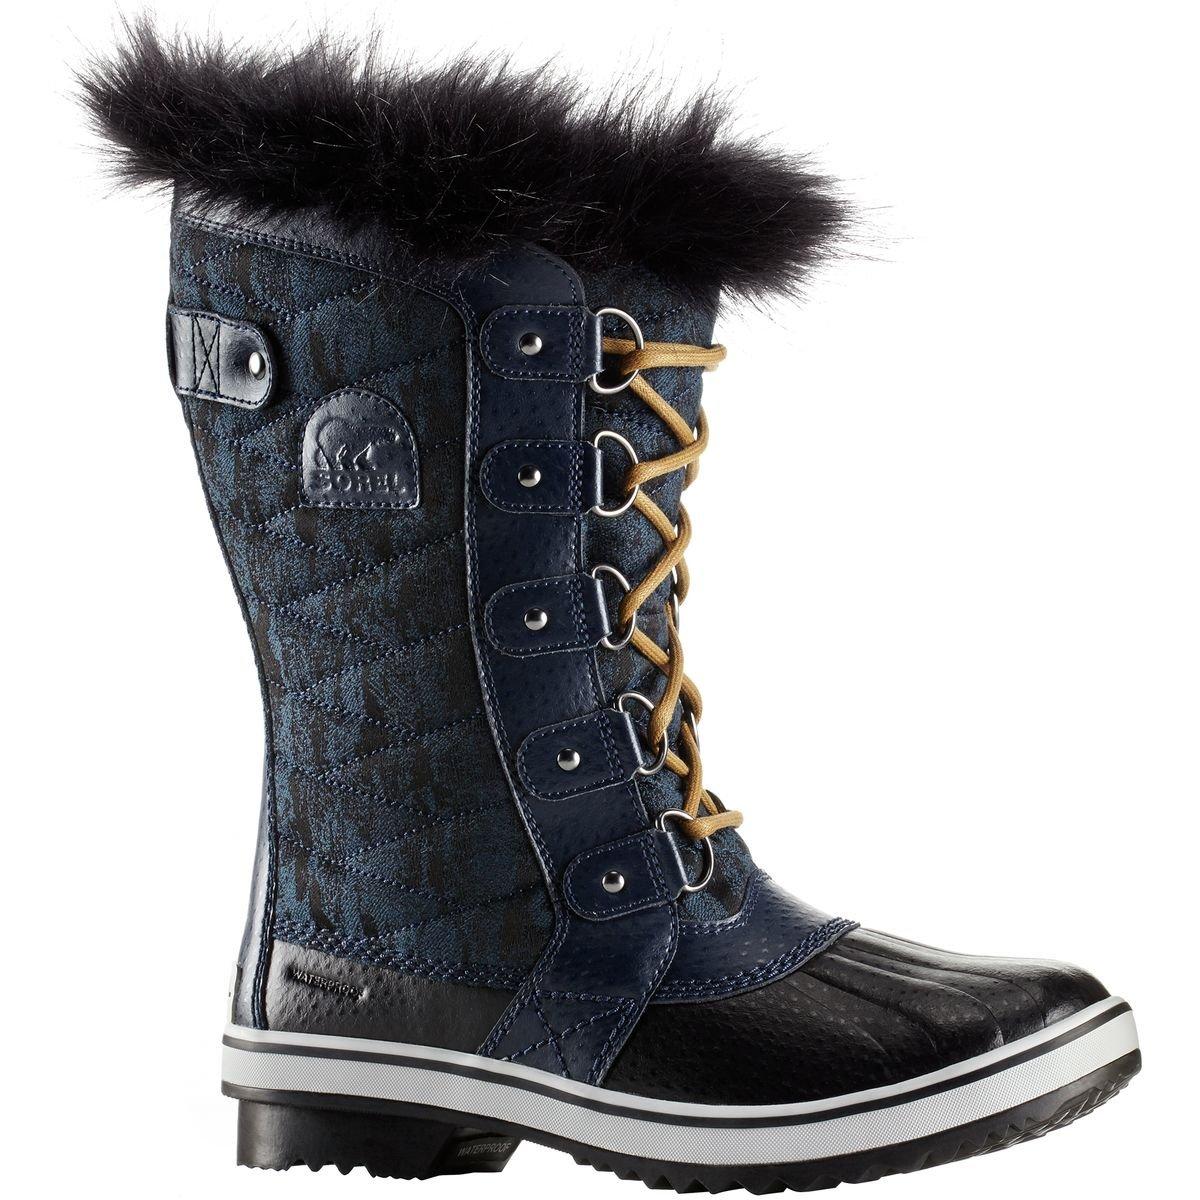 SOREL Women's 10.25 in. Tofino II Waterproof Boots, Collegiate Navy/Glare Blue 7 by SOREL